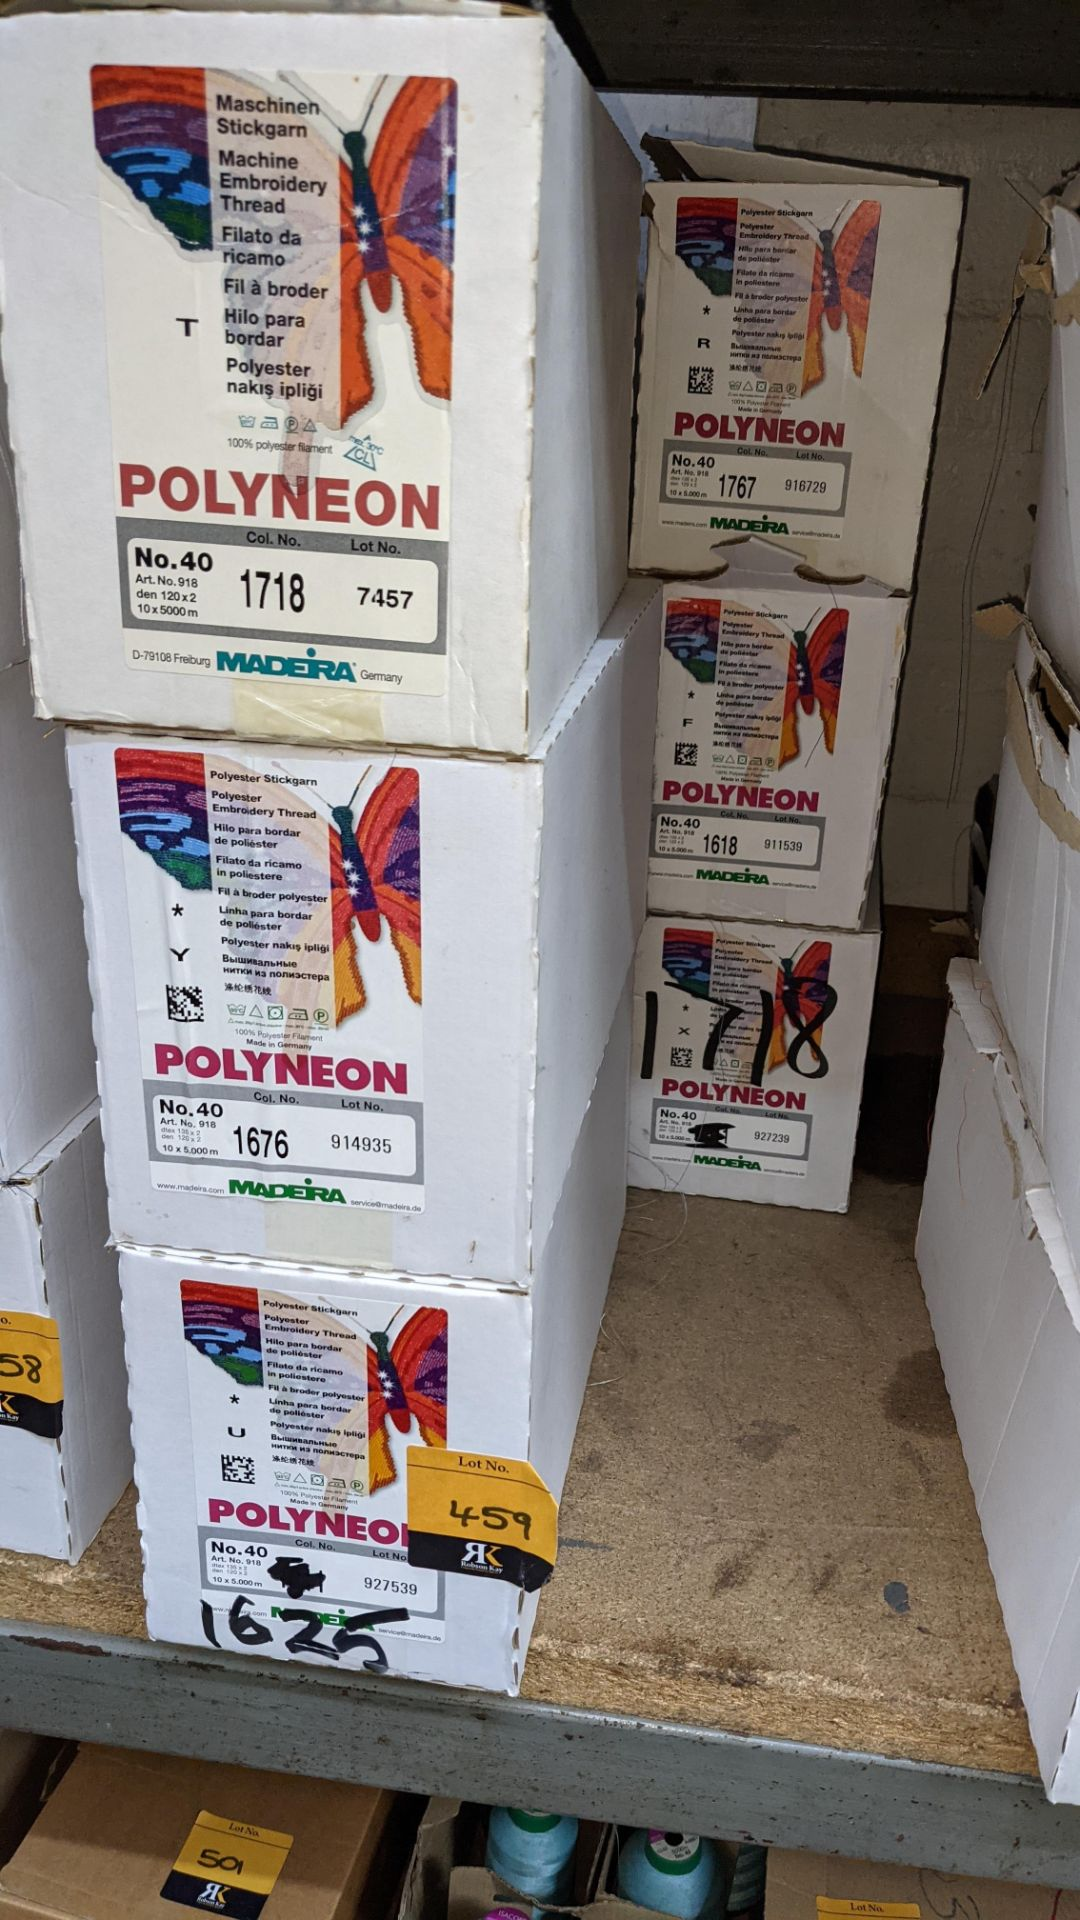 6 boxes of Madeira Polyneon No. 40 polyester embroidery thread